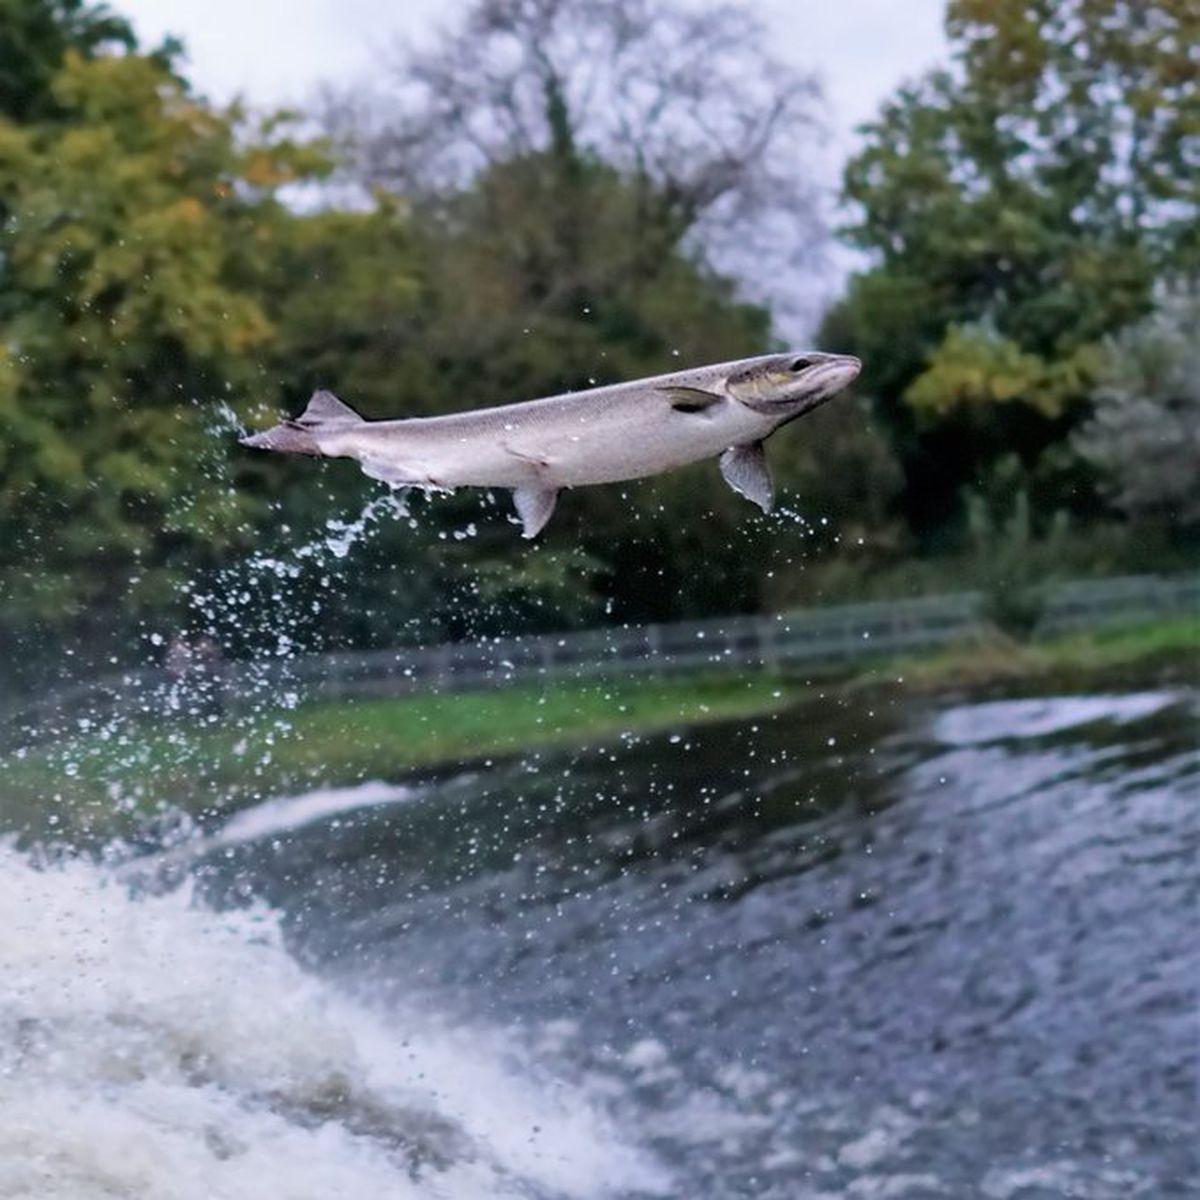 Robin Bennett captured this photo of the Salmon in Shrewsbury